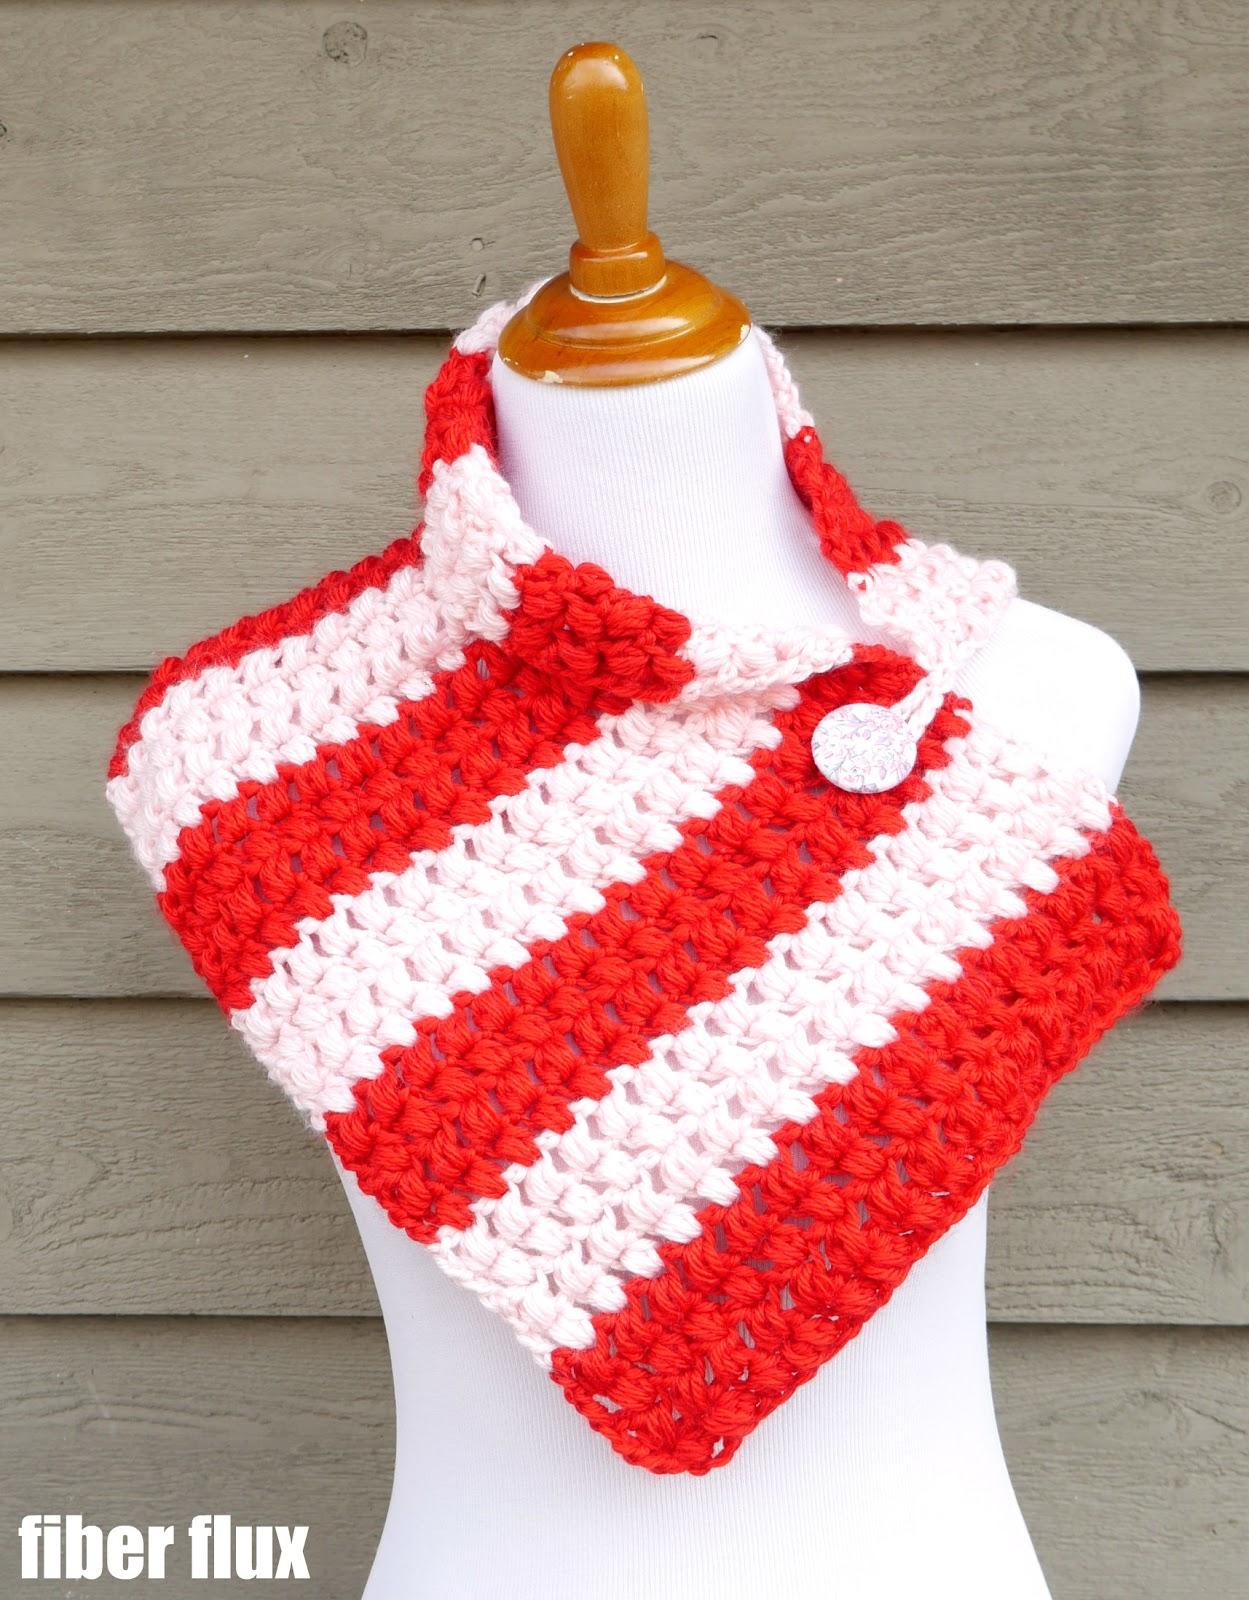 Fiber Flux: Free Crochet Pattern...Peppermint Pop Button Cowl!